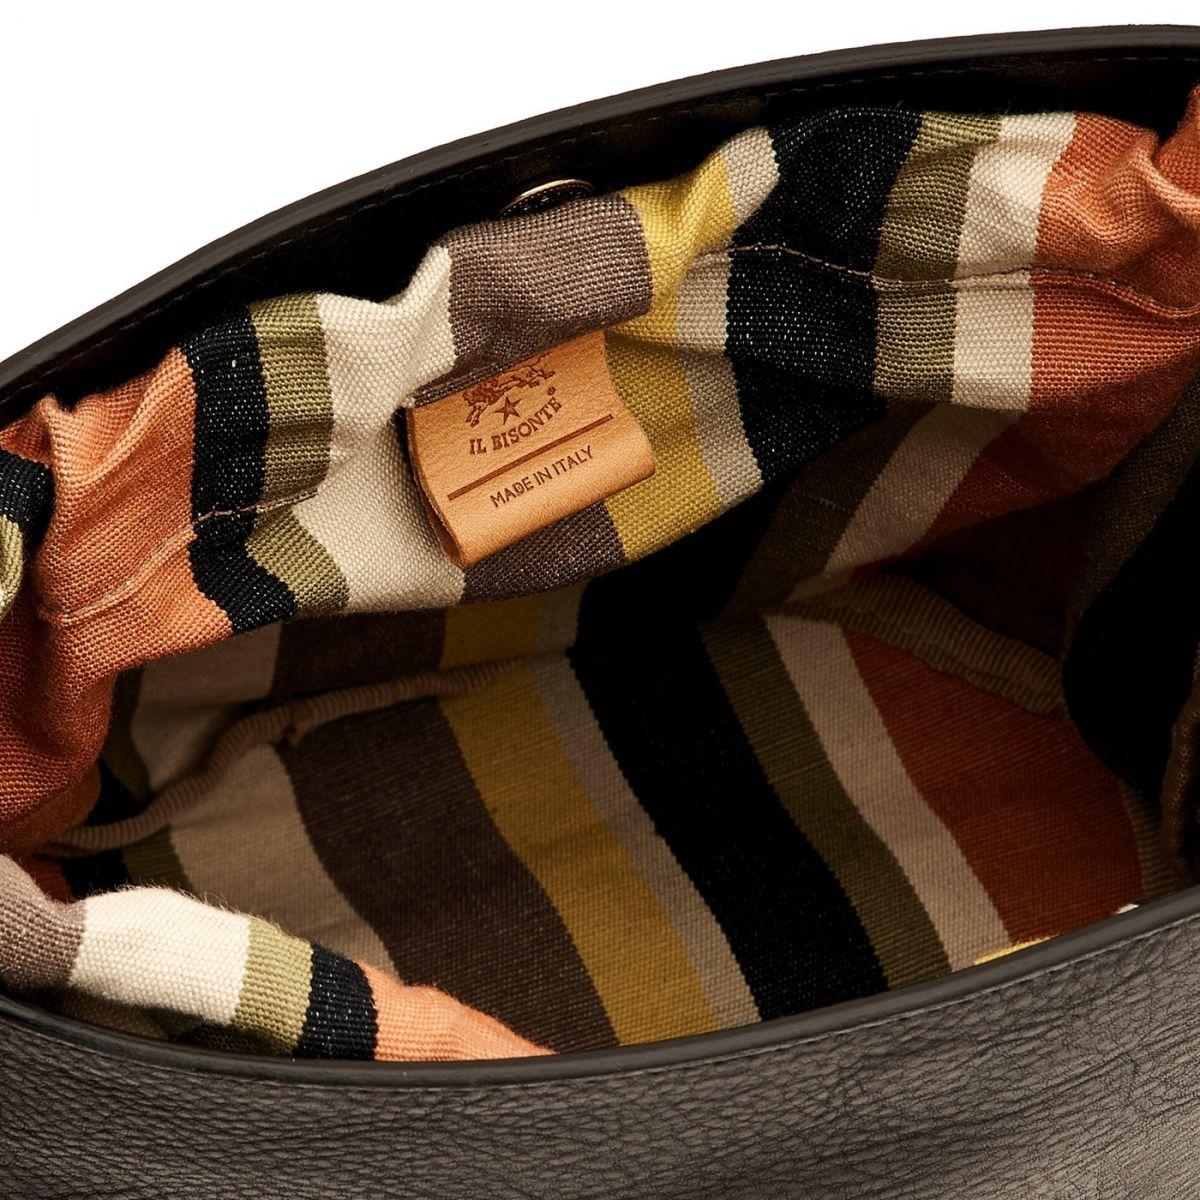 Women's Bucket Bag  in Cowhide Double Leather BBU018 color Black/Light Grey | Details